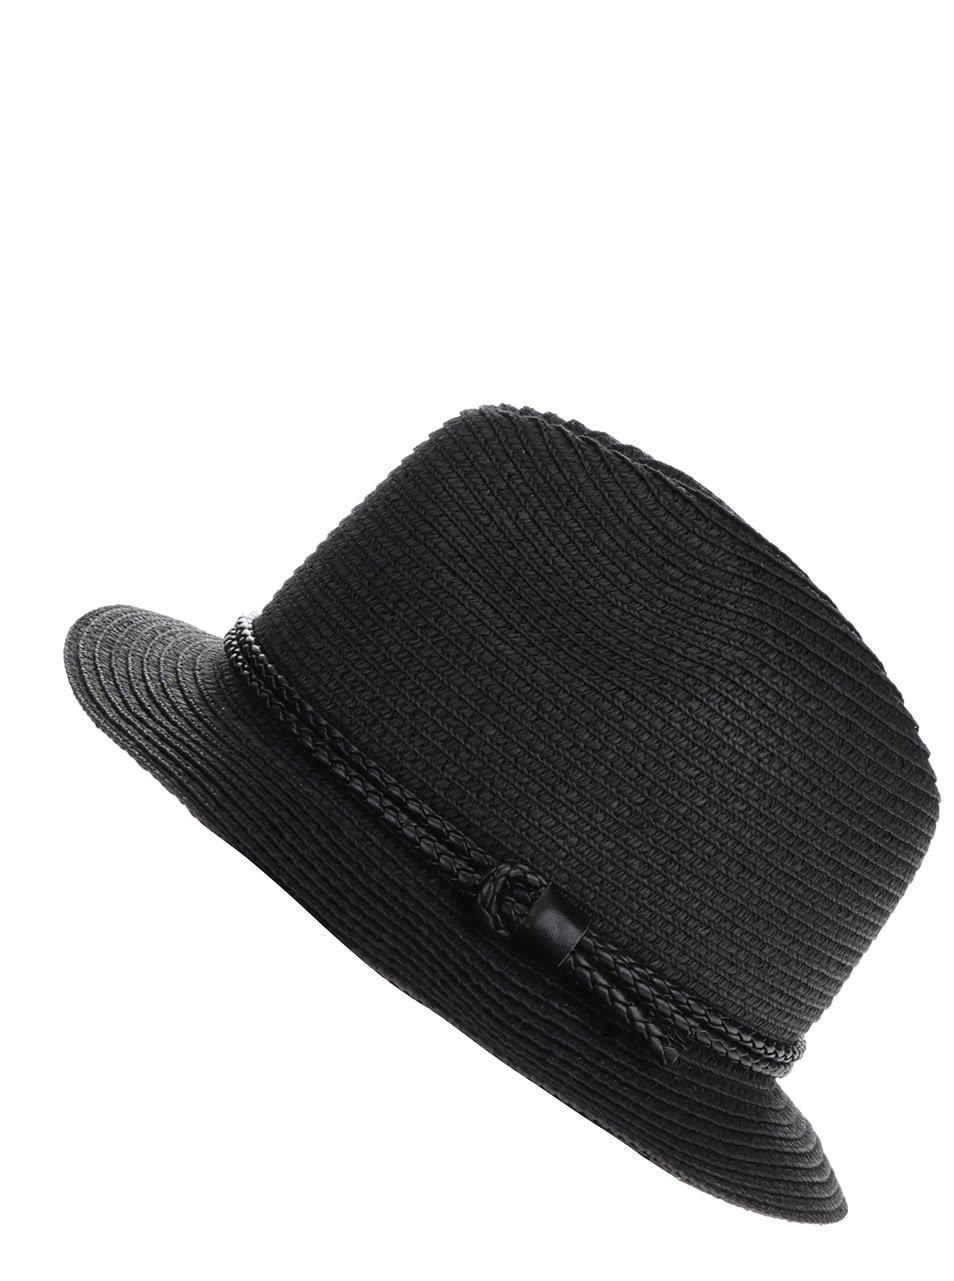 Černý klobouk s ozdobným páskem Pieces Lea 5e641835ec